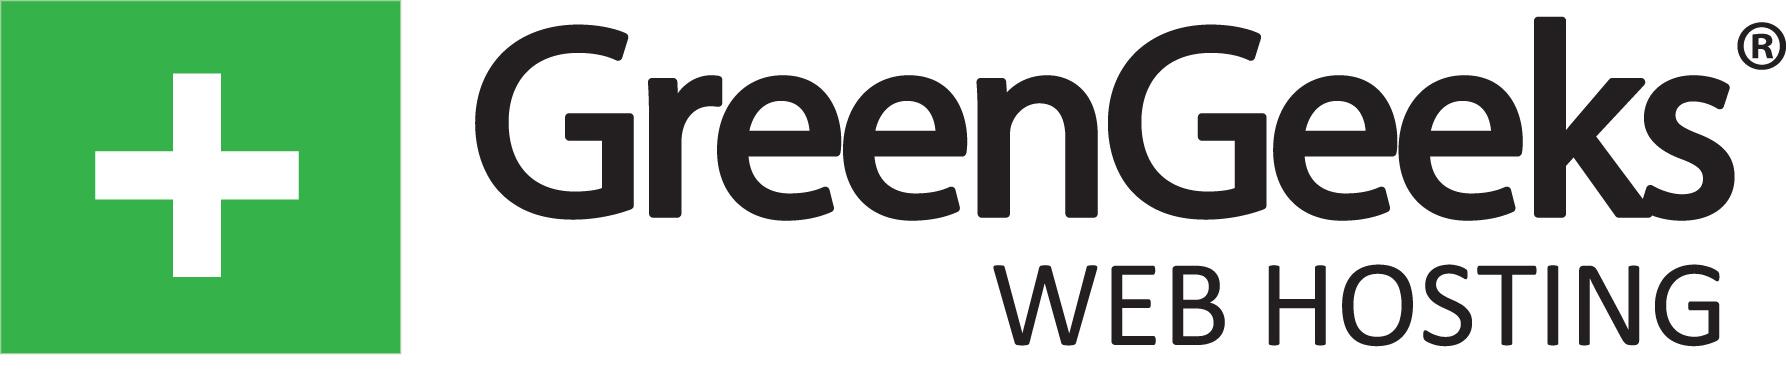 GreenGeeks: Save up to 75% with Premium Eco-Hosting